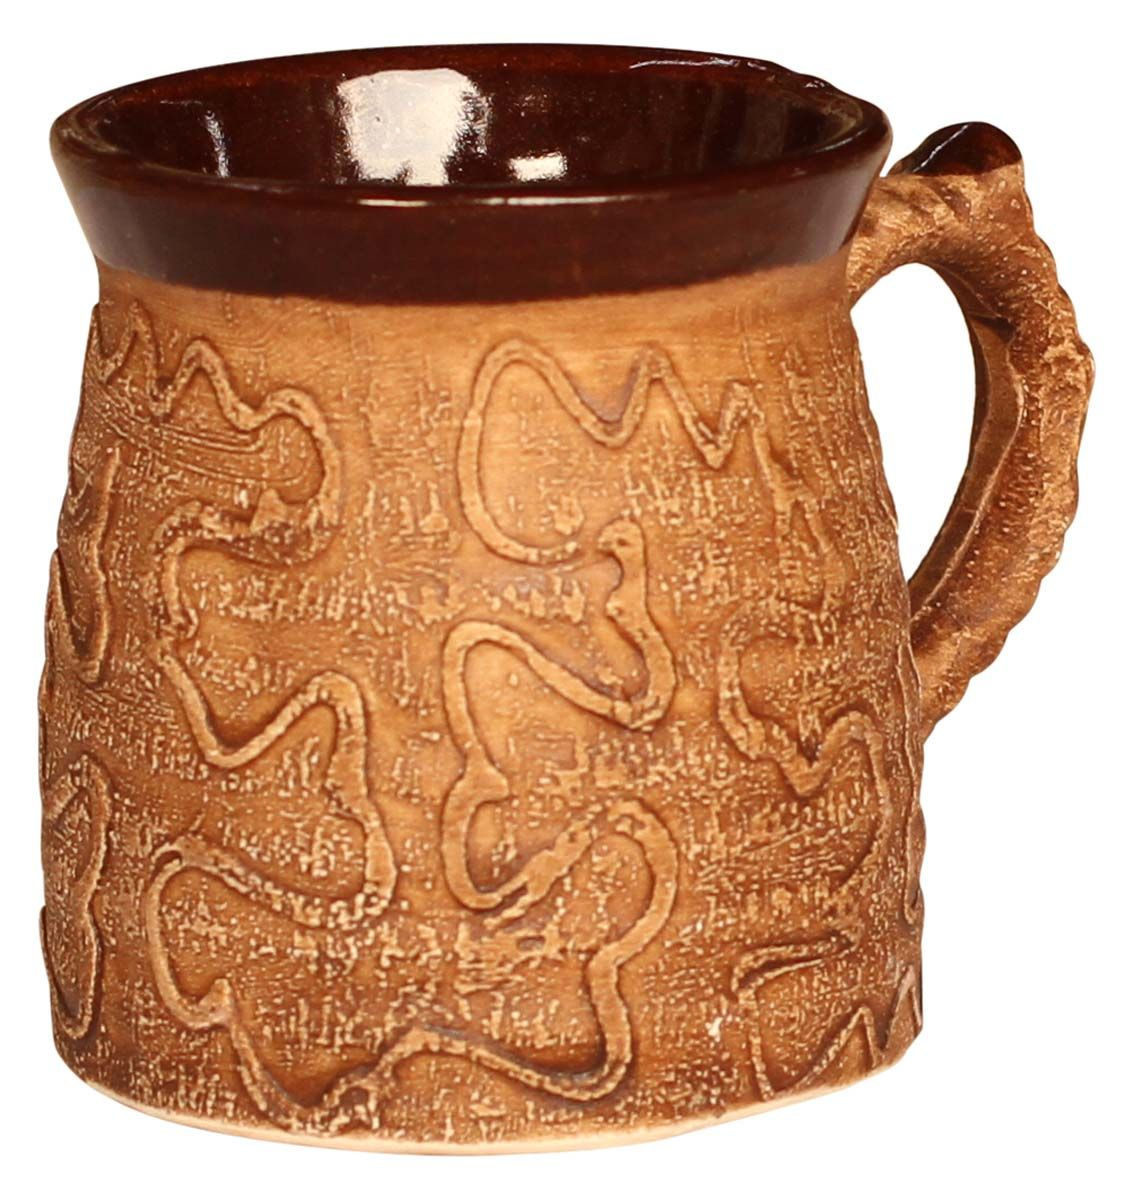 Bulk Wholesale Handmade Glazed Ceramic Coffee Tea Mug Hand Painted Textured Shades Of Brown Home Kitchen Access Mugs Wholesale Cups Handmade Ceramics